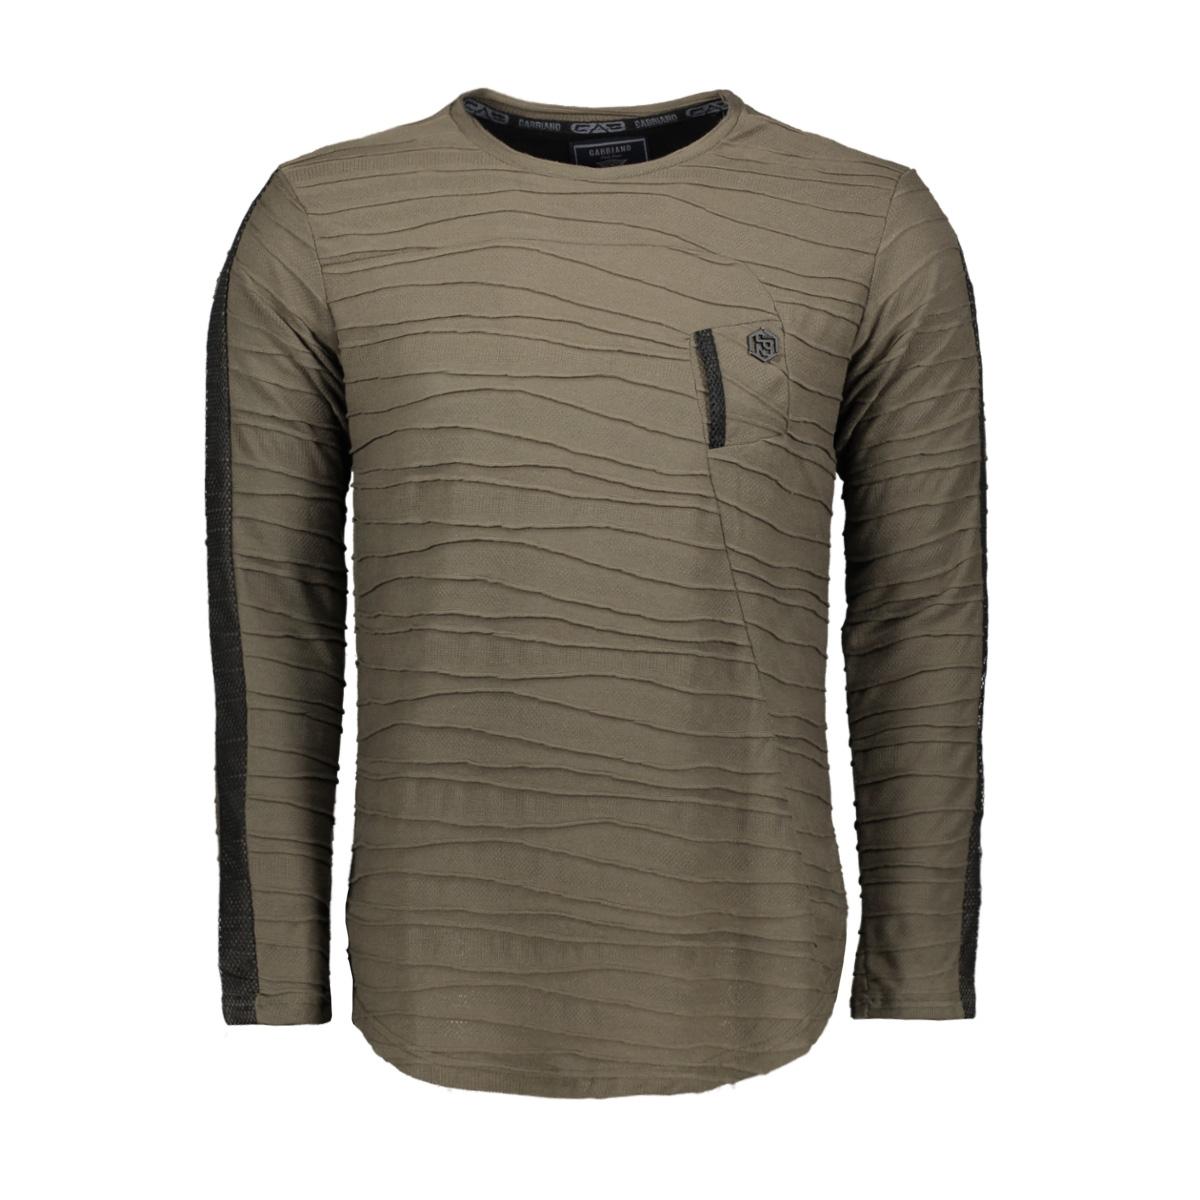 longsleeve 15164 gabbiano t-shirt army